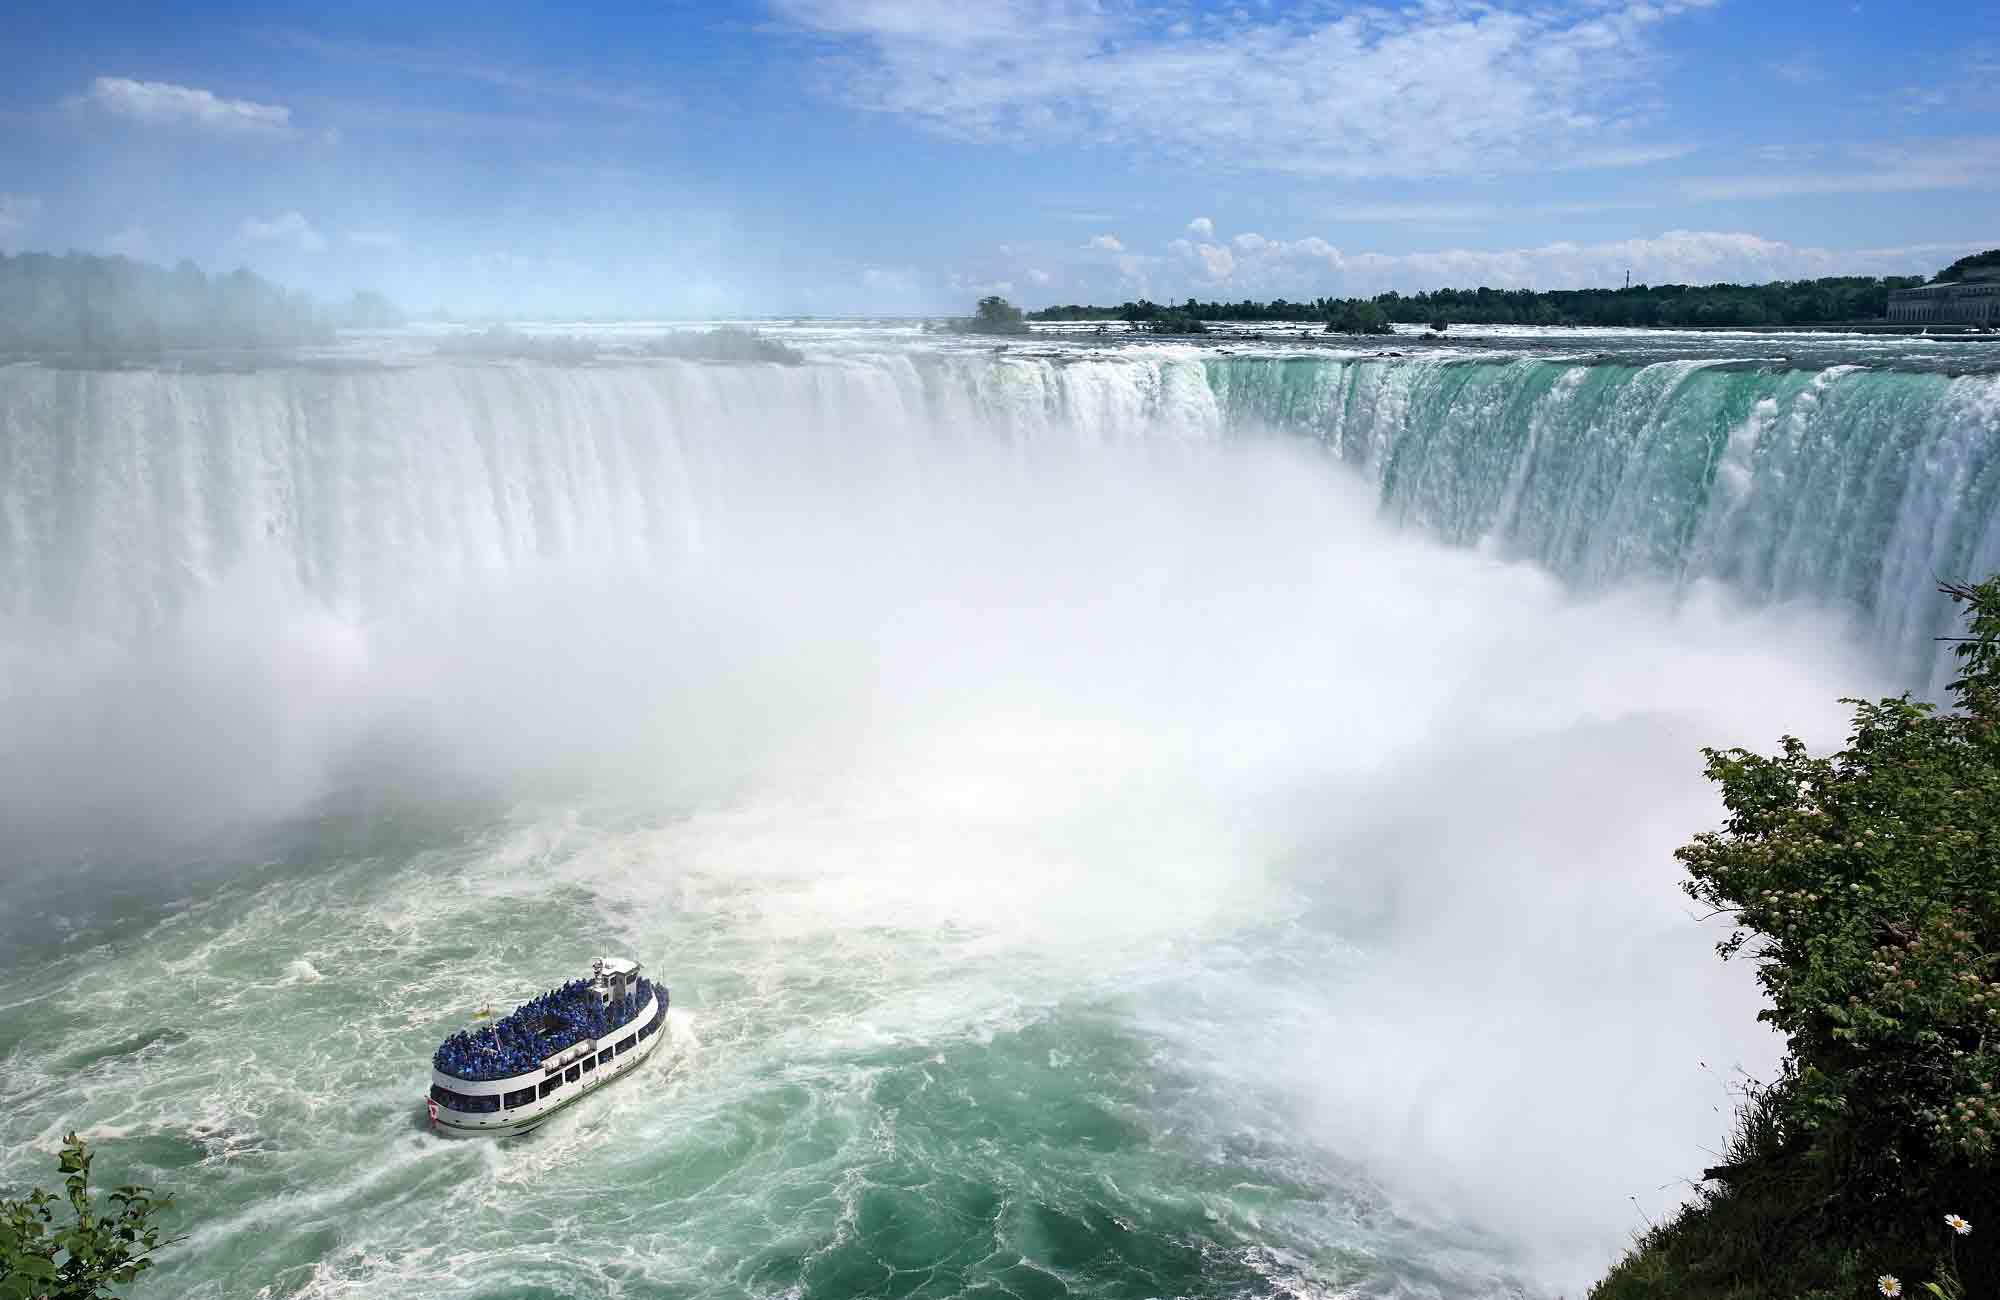 Voyage Canada Etats-Unis - Chutes du Niagara - Amplitudes